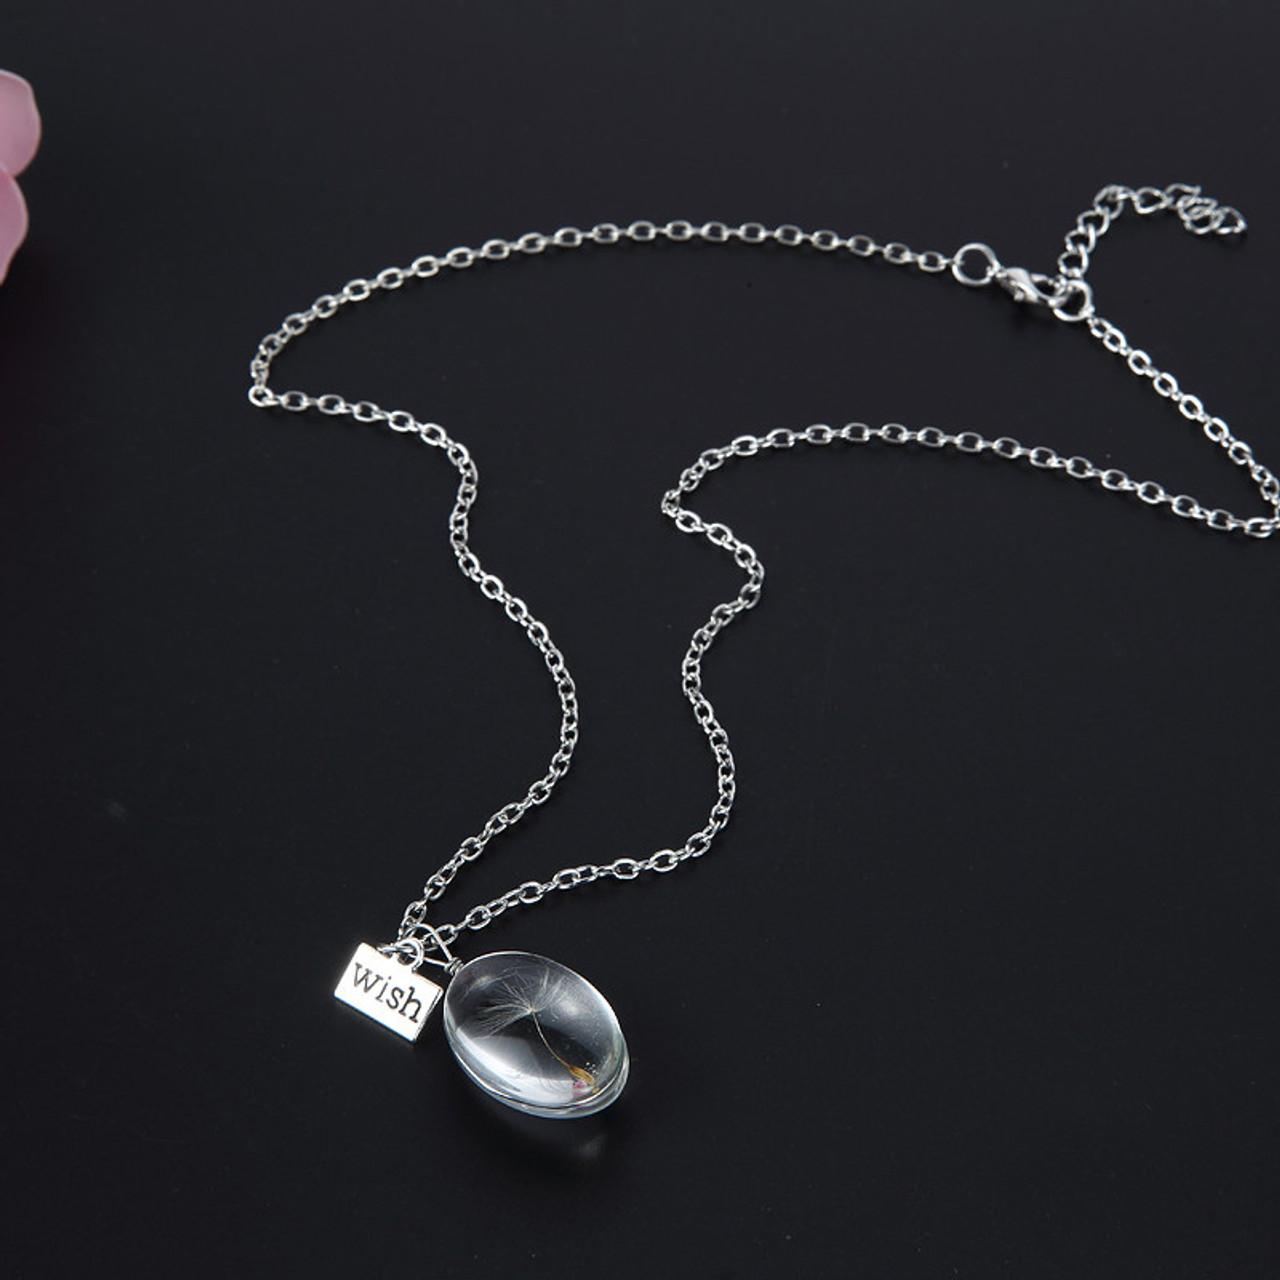 Oval Dandelion Wish Necklace